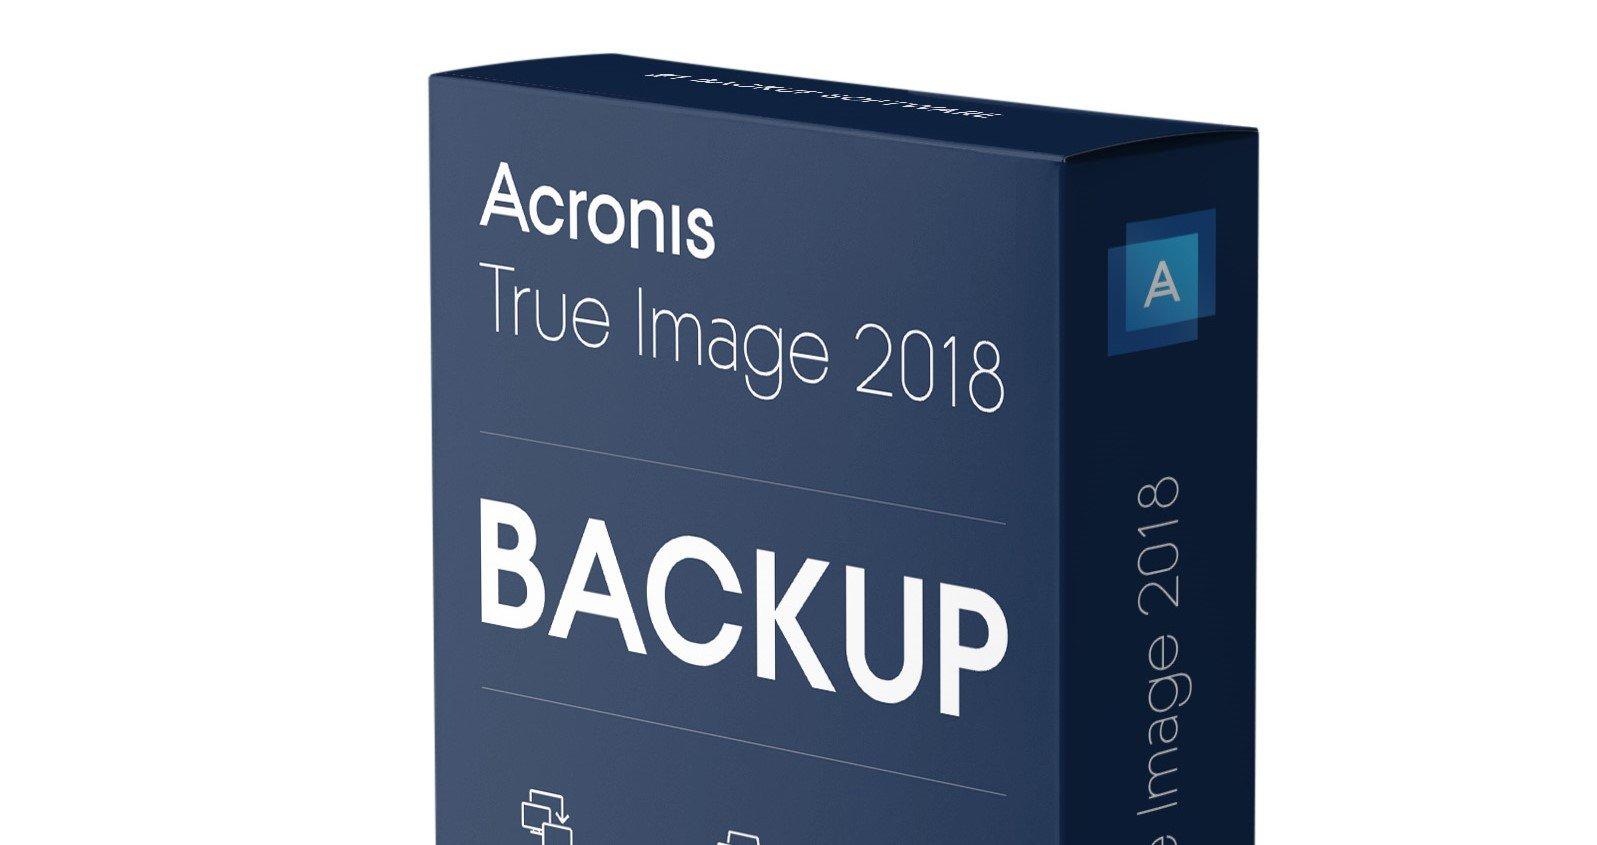 acronis-vrai-image-2018-AI-banner